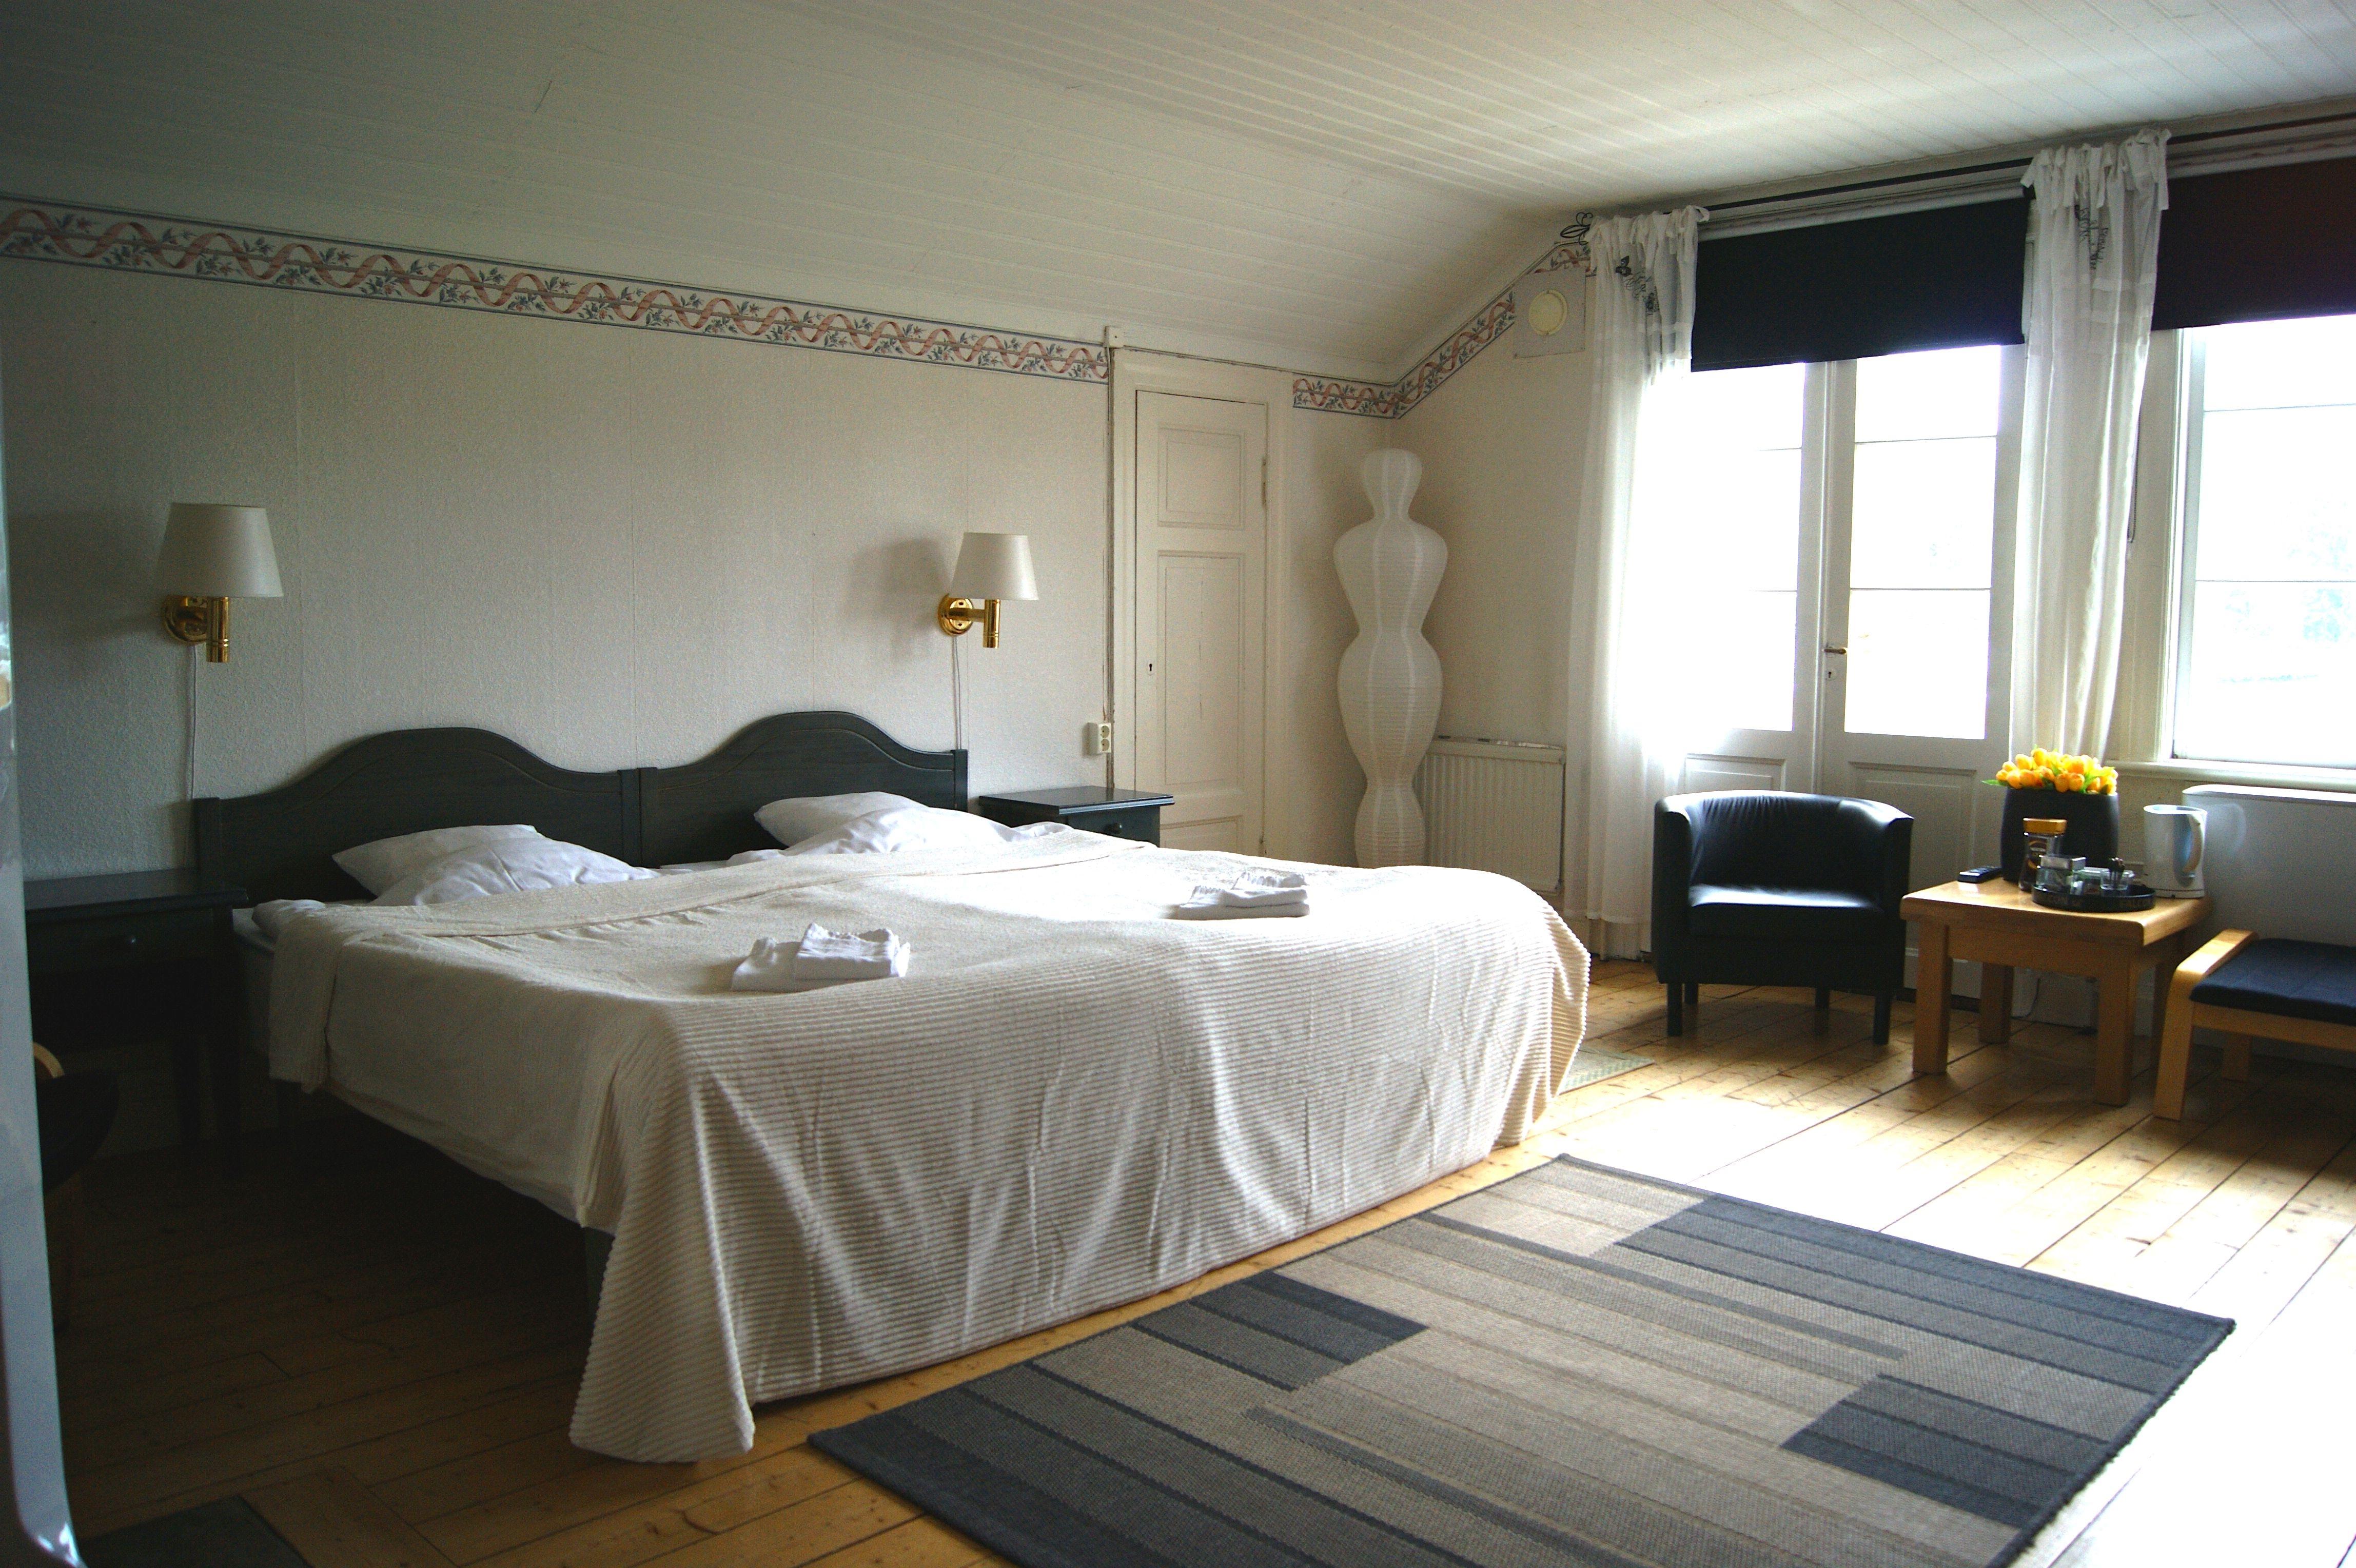 27 Hotelroom small building